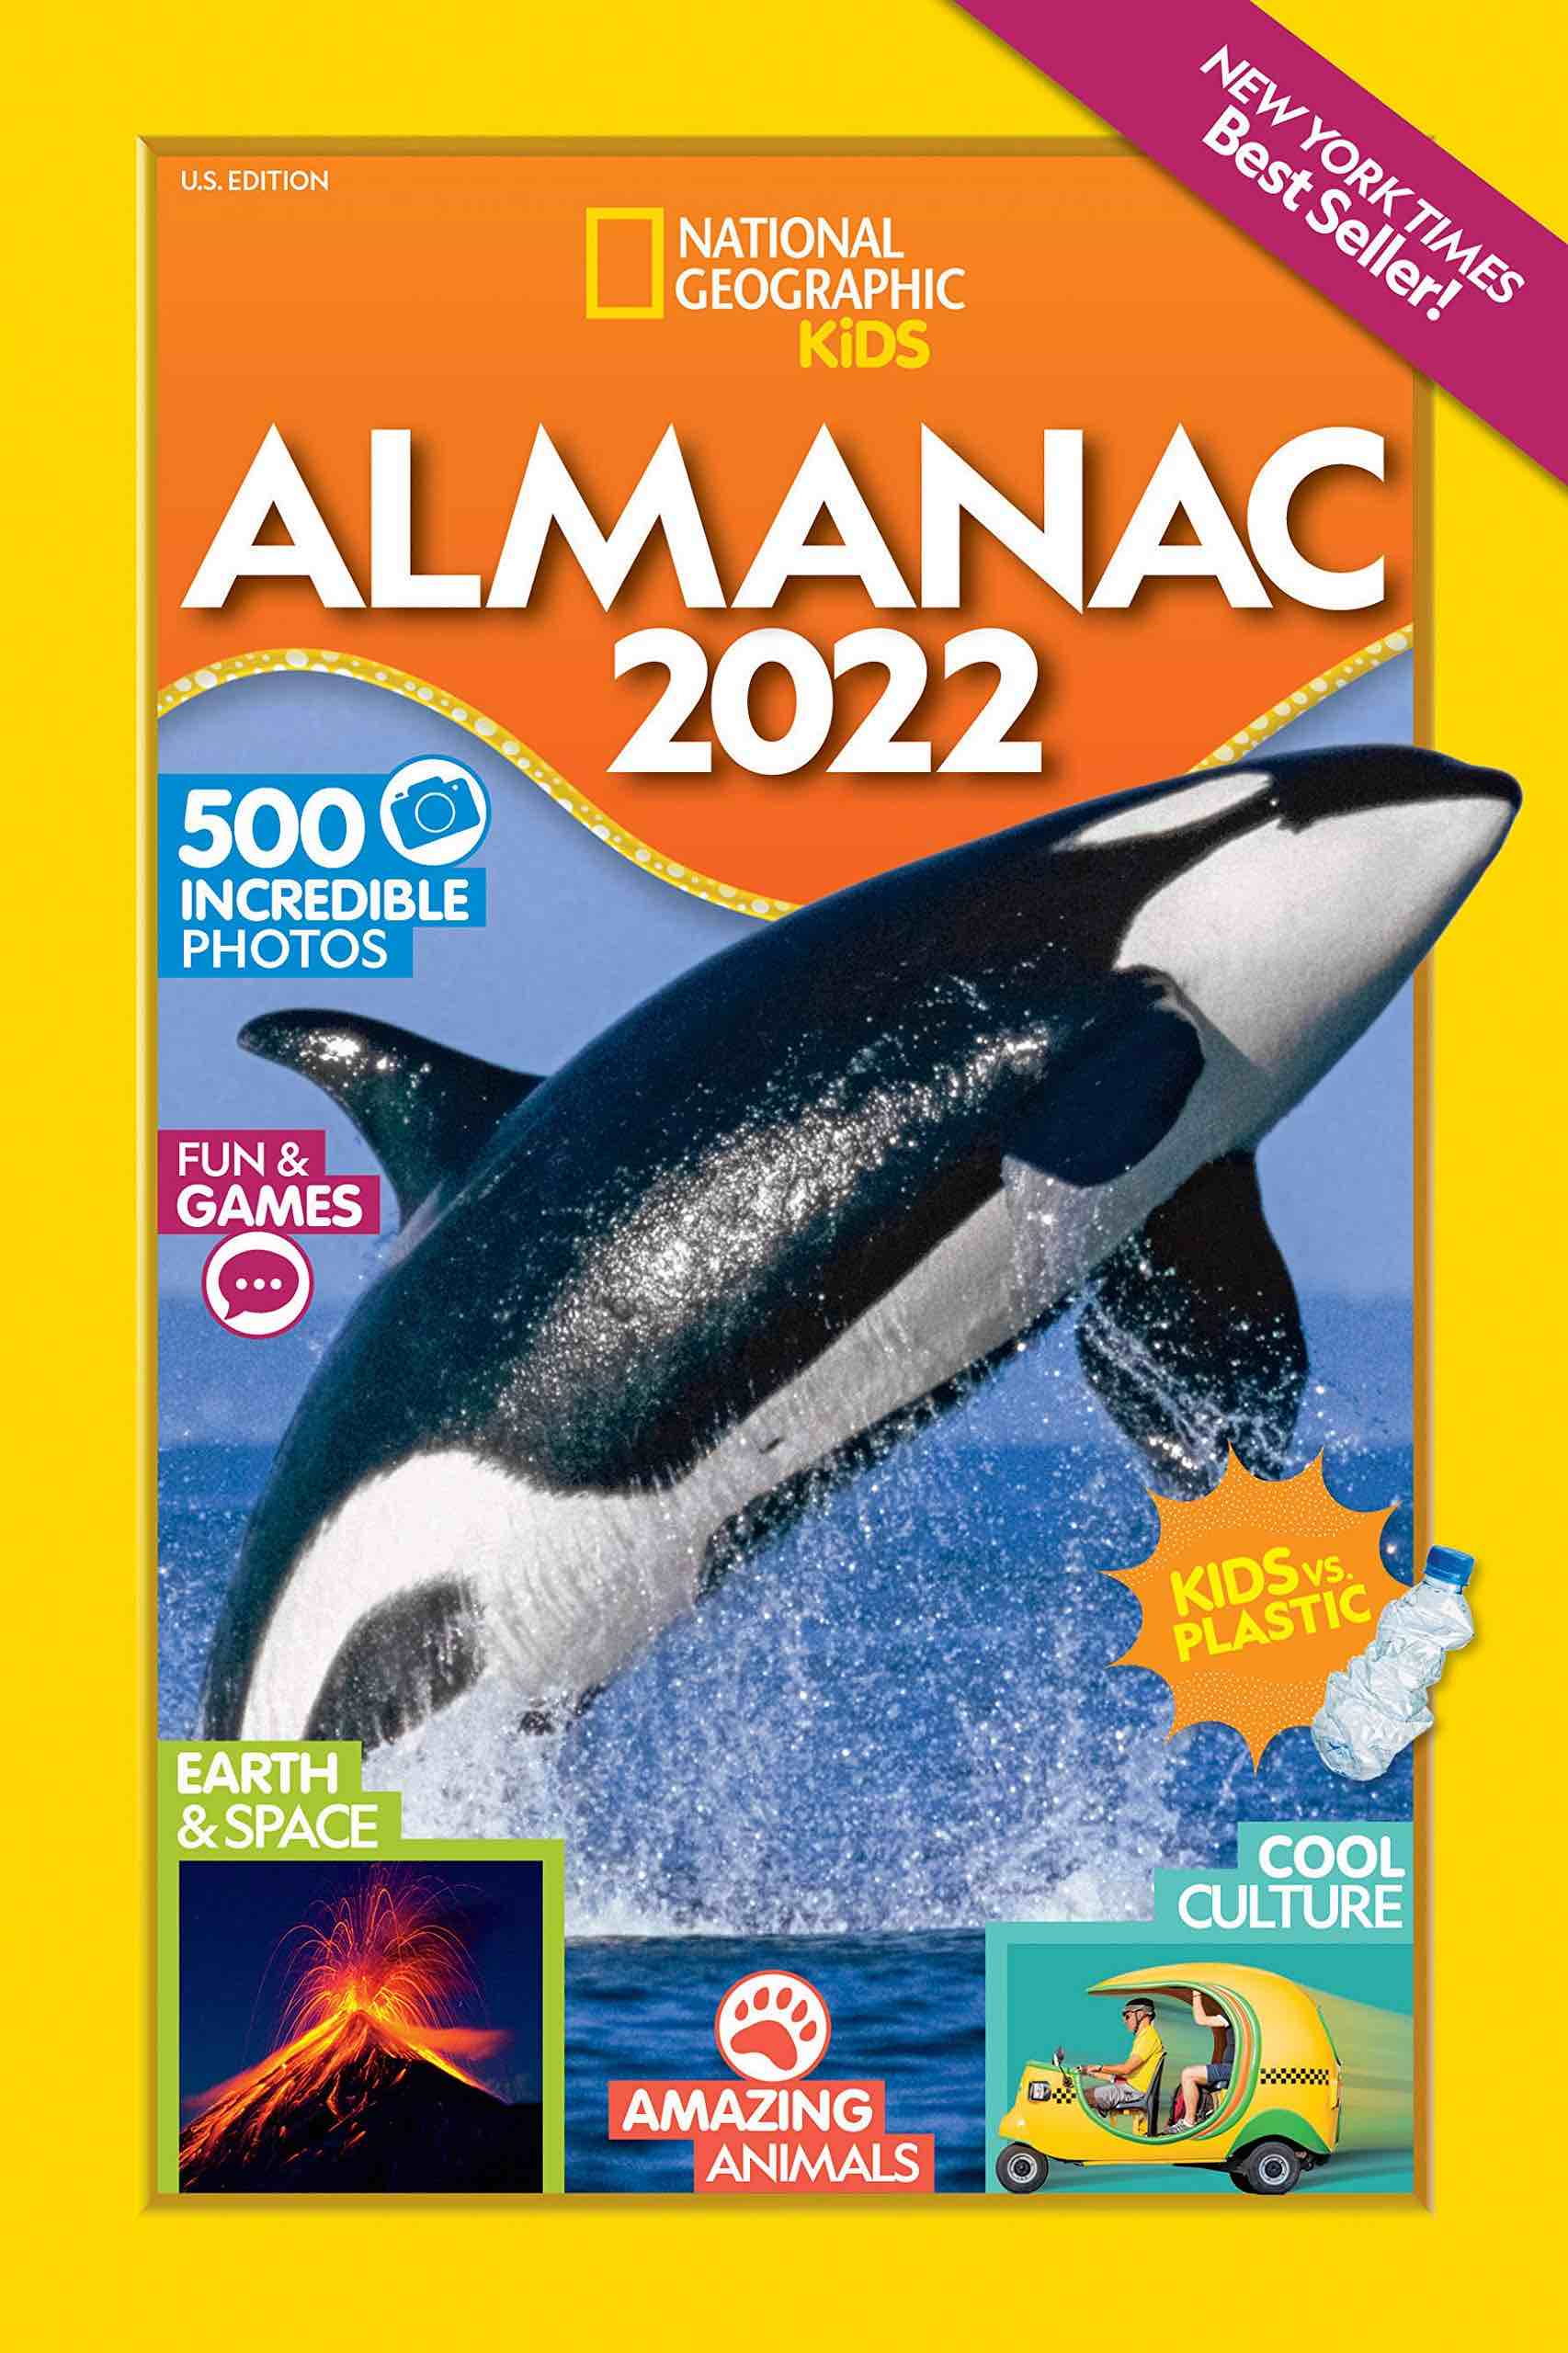 National Geographic Almanac 2022